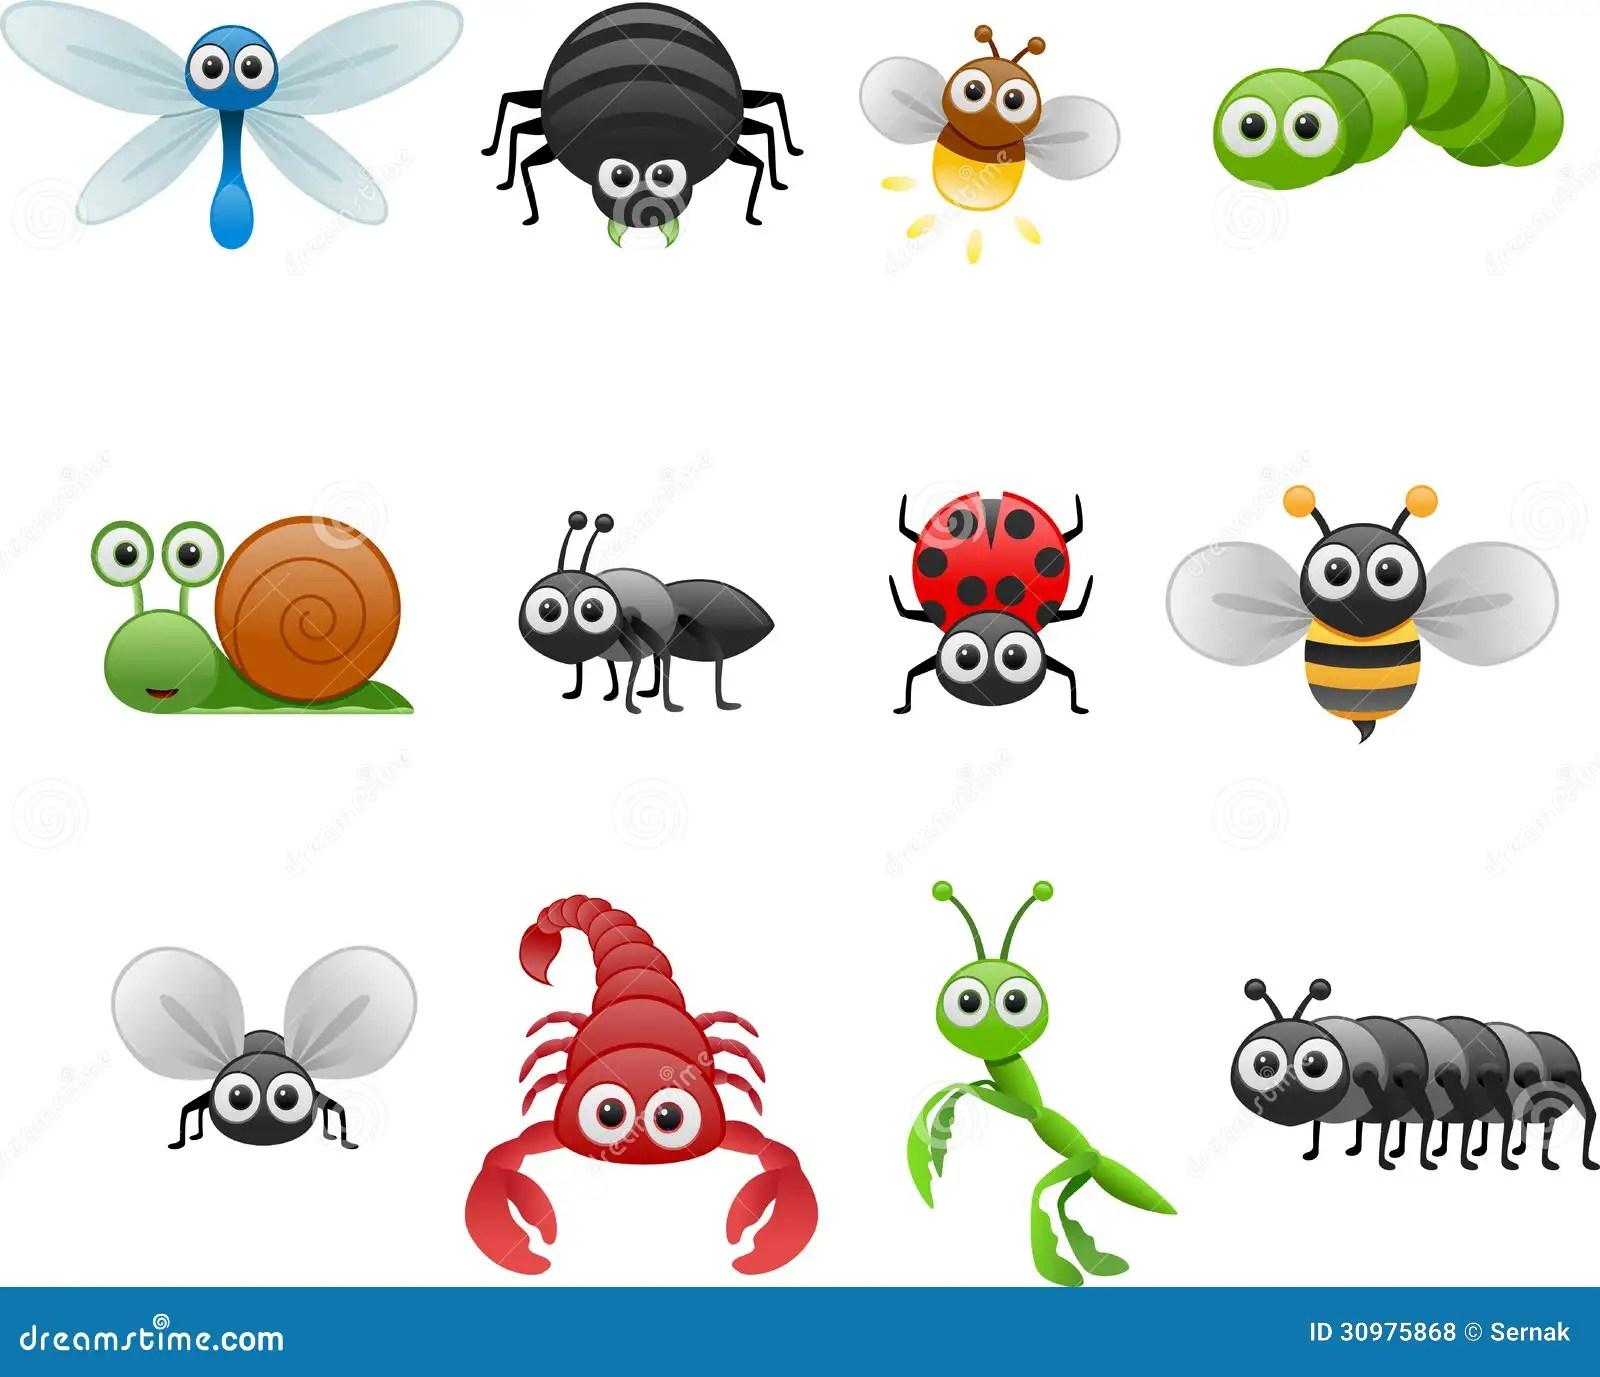 Cartoon Insect Set Royalty Free Stock Photos